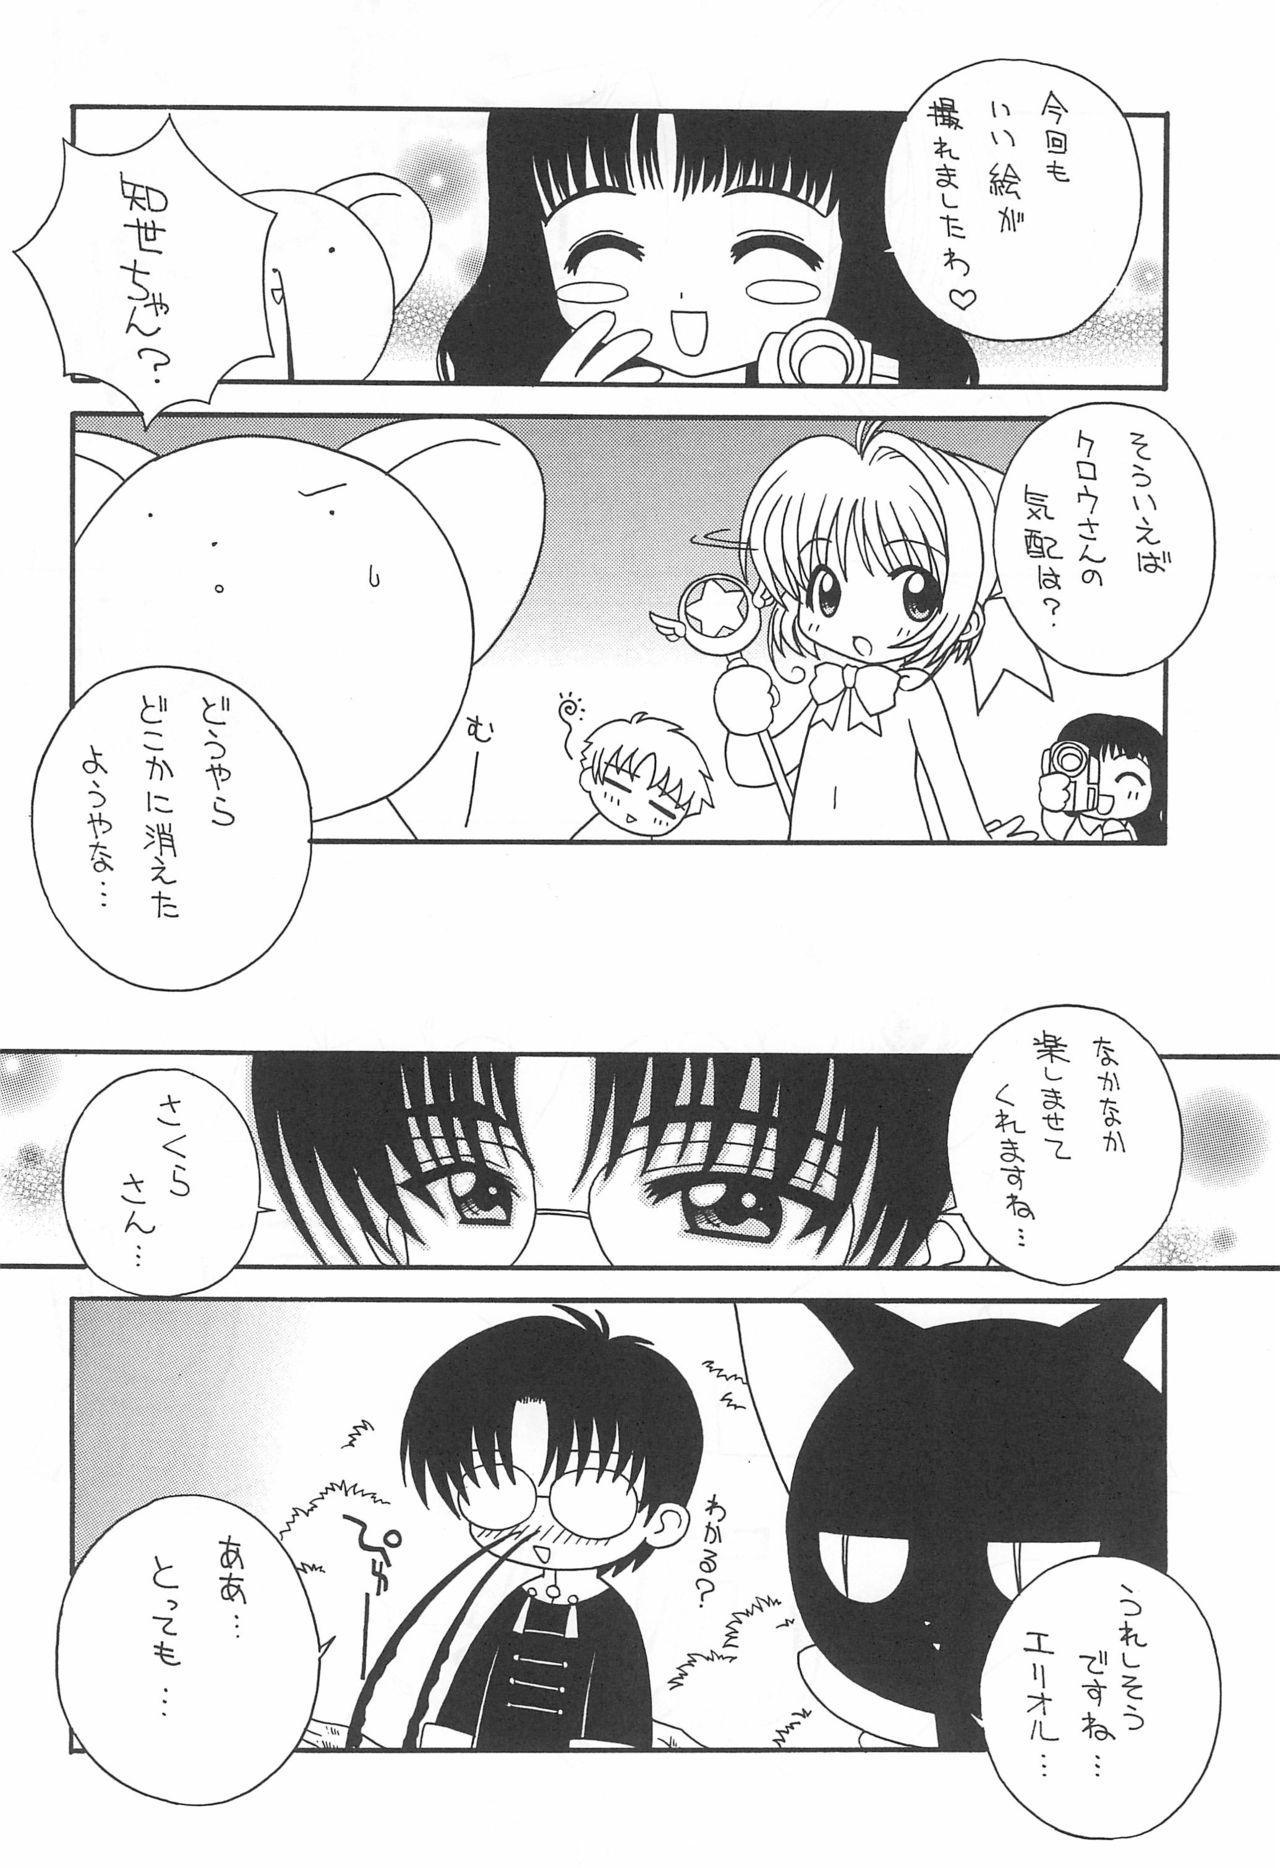 Soko da! Ninpou Youji Taikei no Jutsu 2nd 11